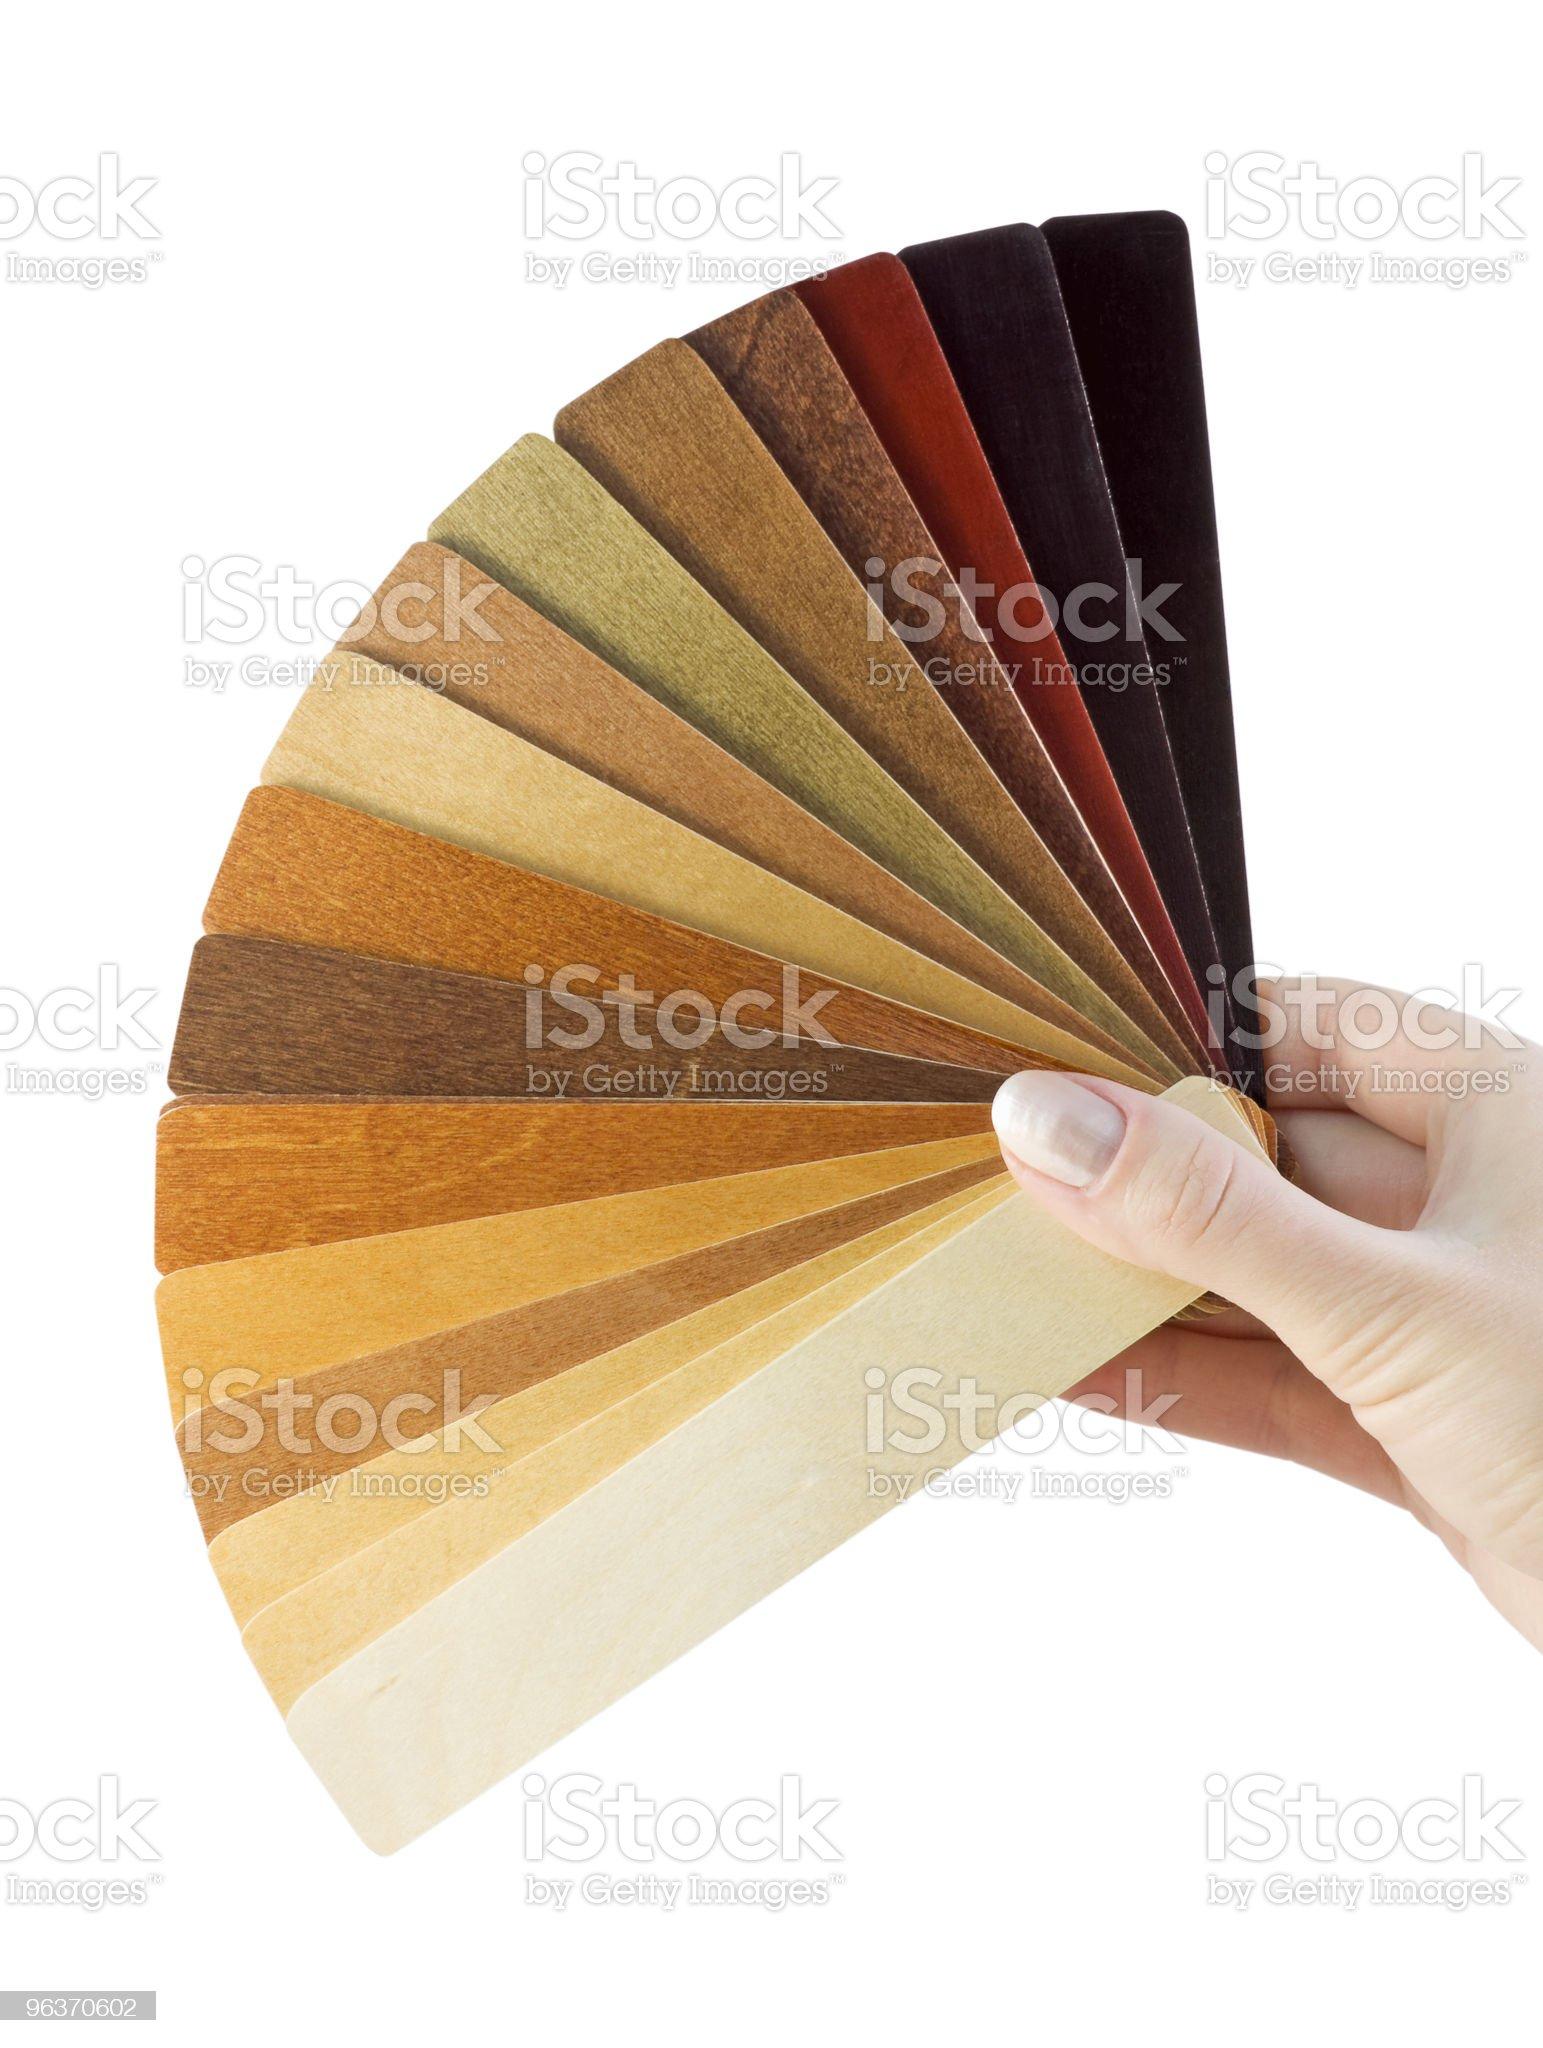 samples of wood coatings royalty-free stock photo